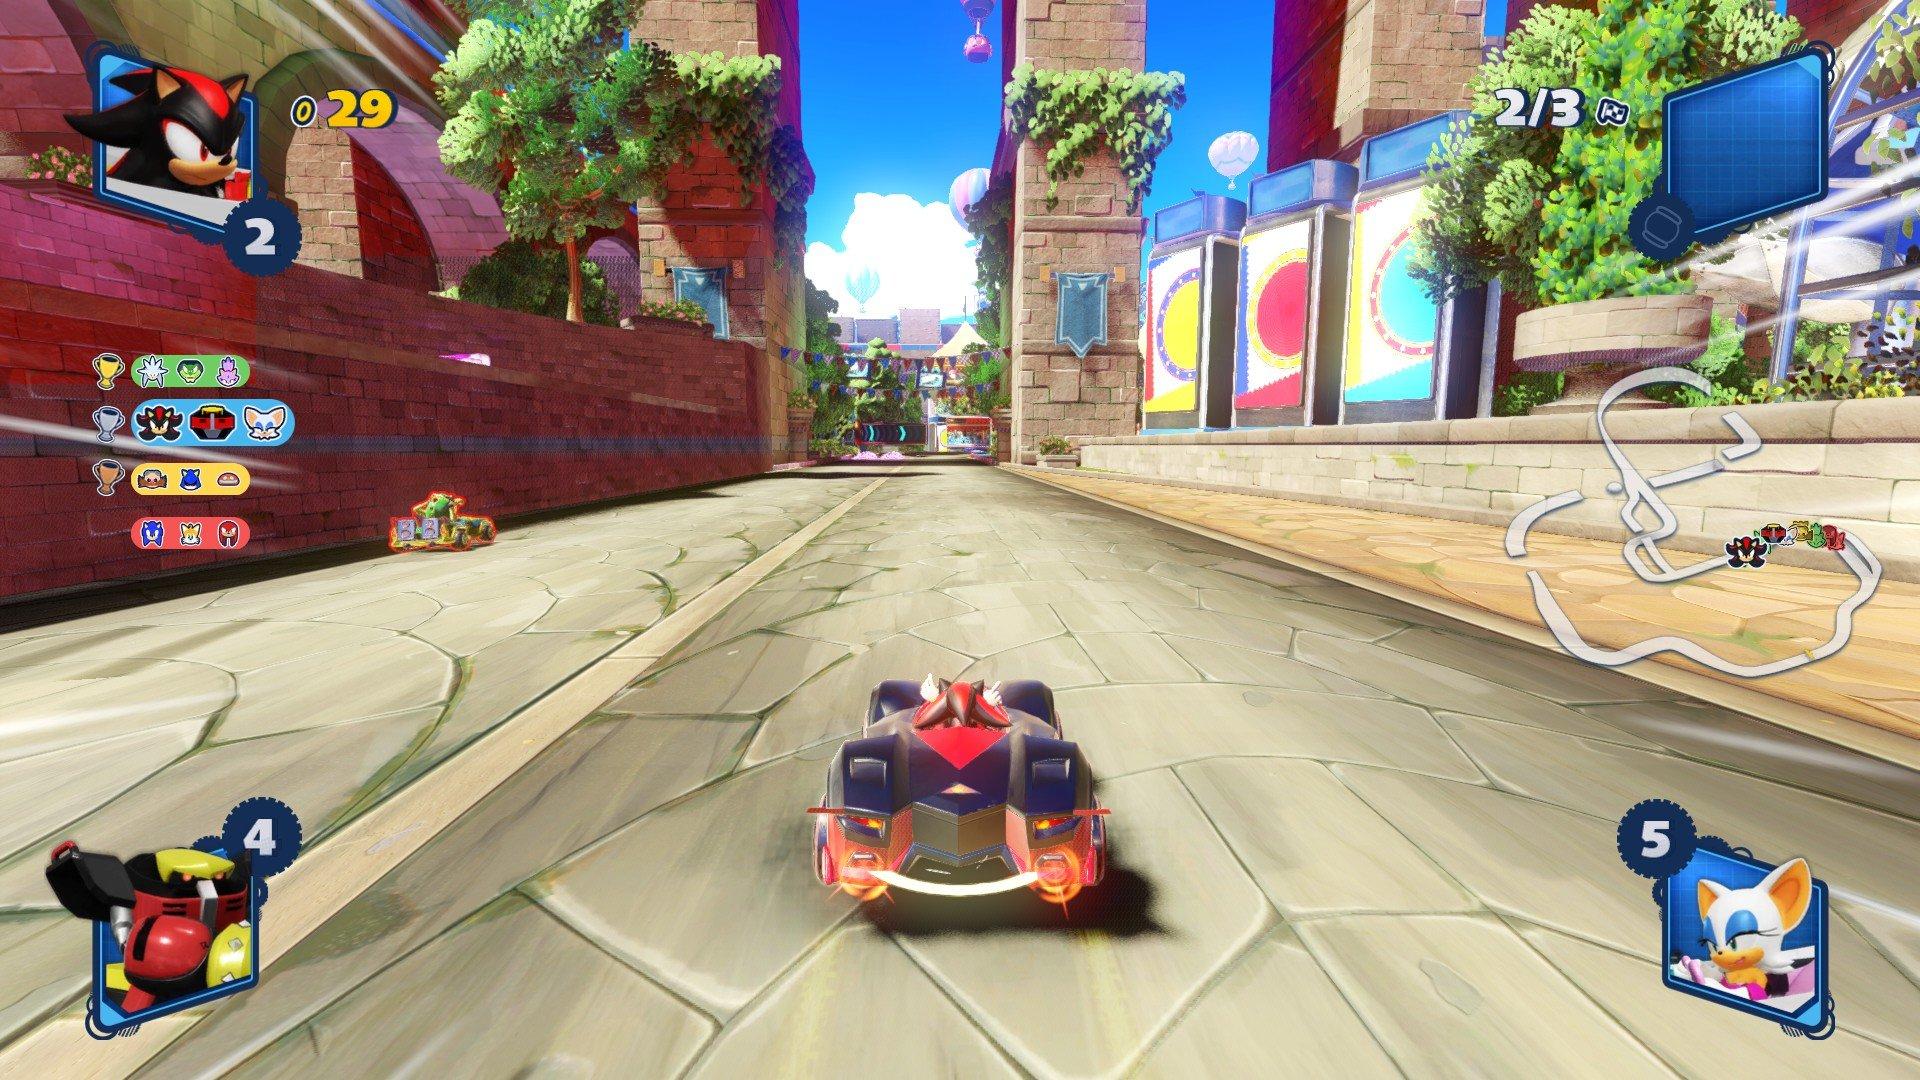 Allsonicgames Net official review: team sonic racing (computer)   gbatemp